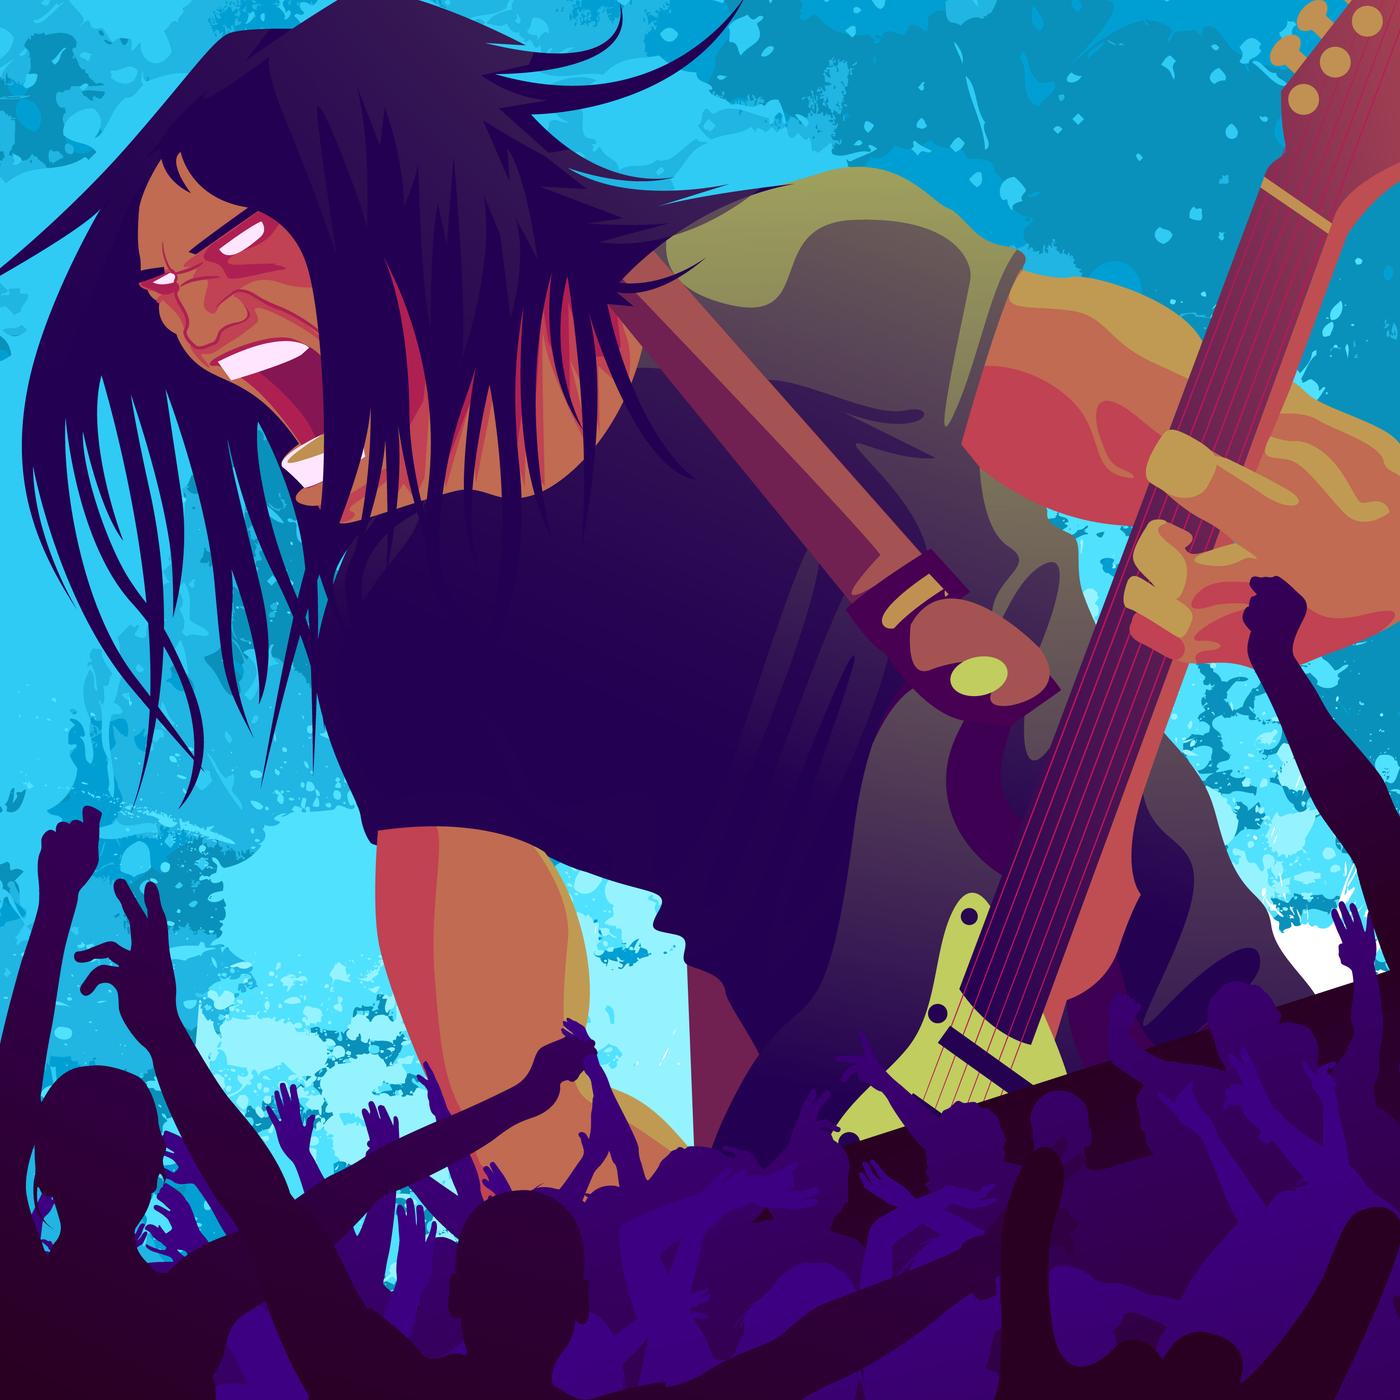 rockradiocom rock music for life - Death Metal Christmas Songs